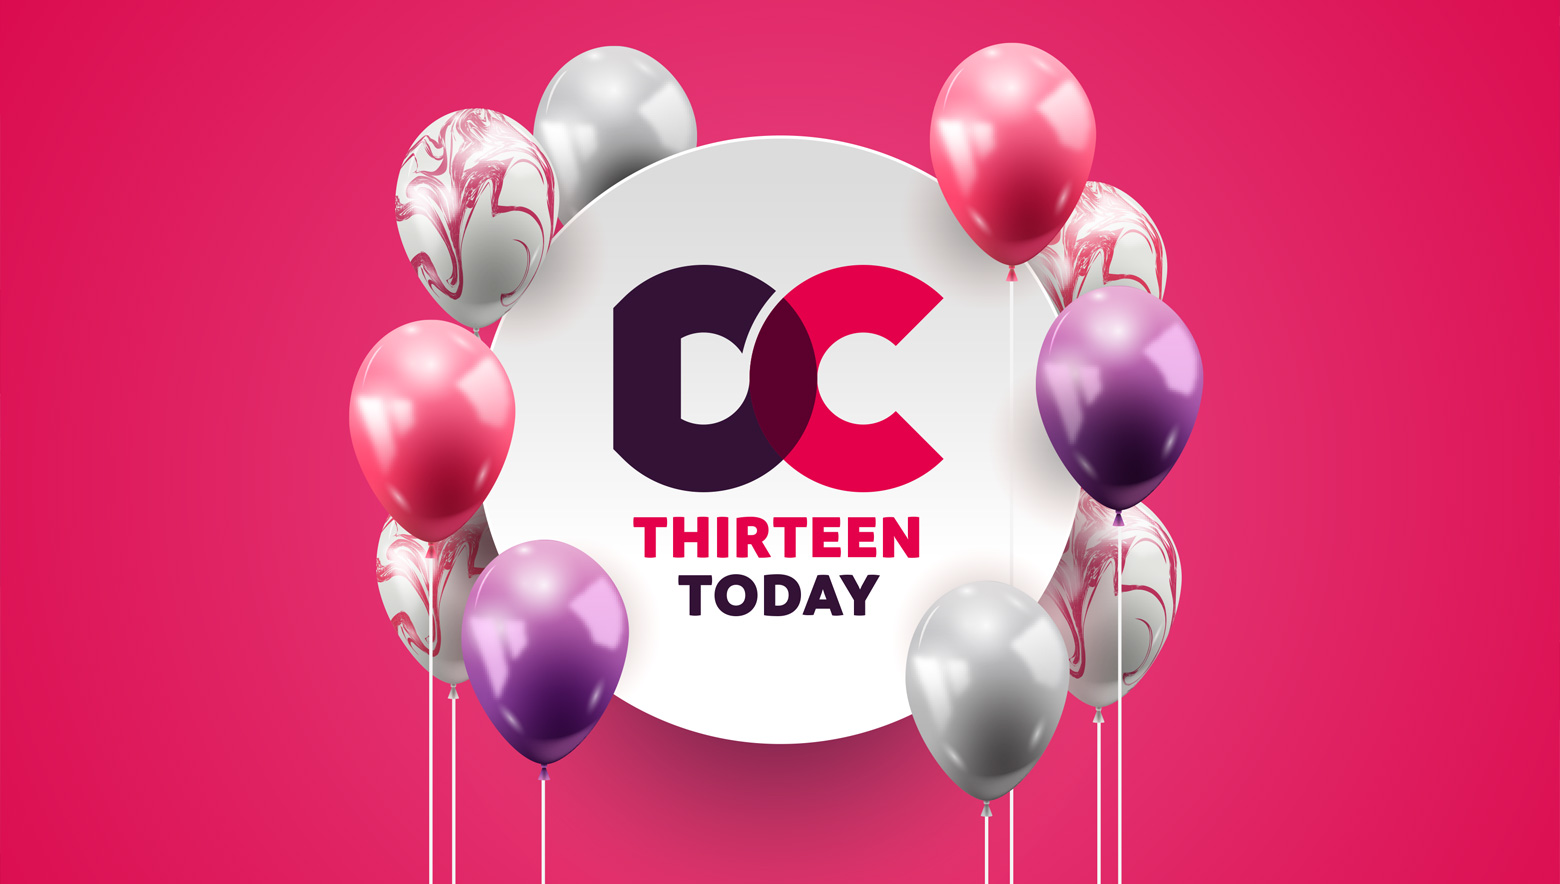 Happy Birthday DC